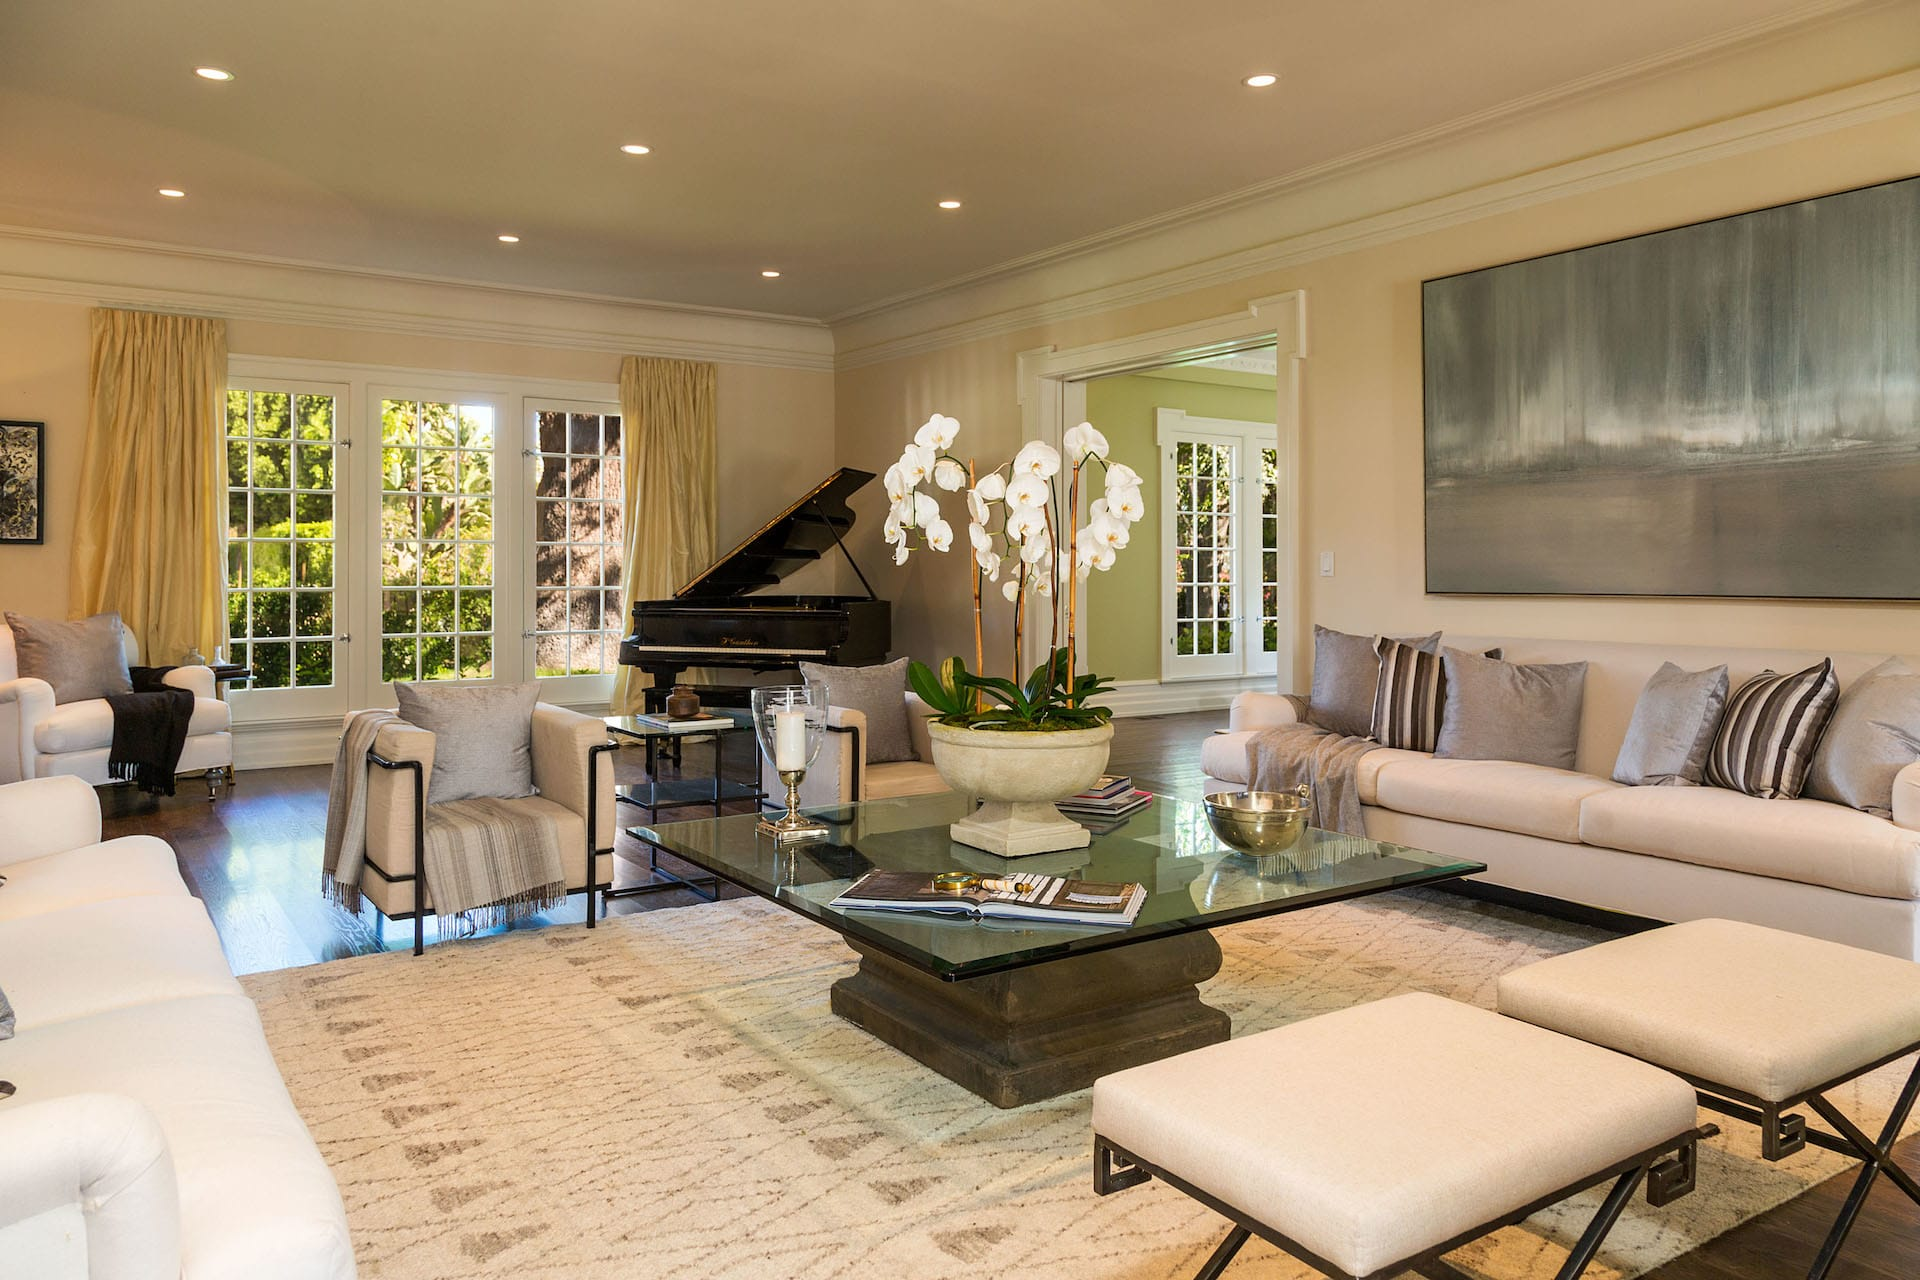 Additional photo for property listing at 227 Copa De Oro Rd 227 Copa De Oro Rd Los Angeles, Kaliforniya,90077 Amerika Birleşik Devletleri